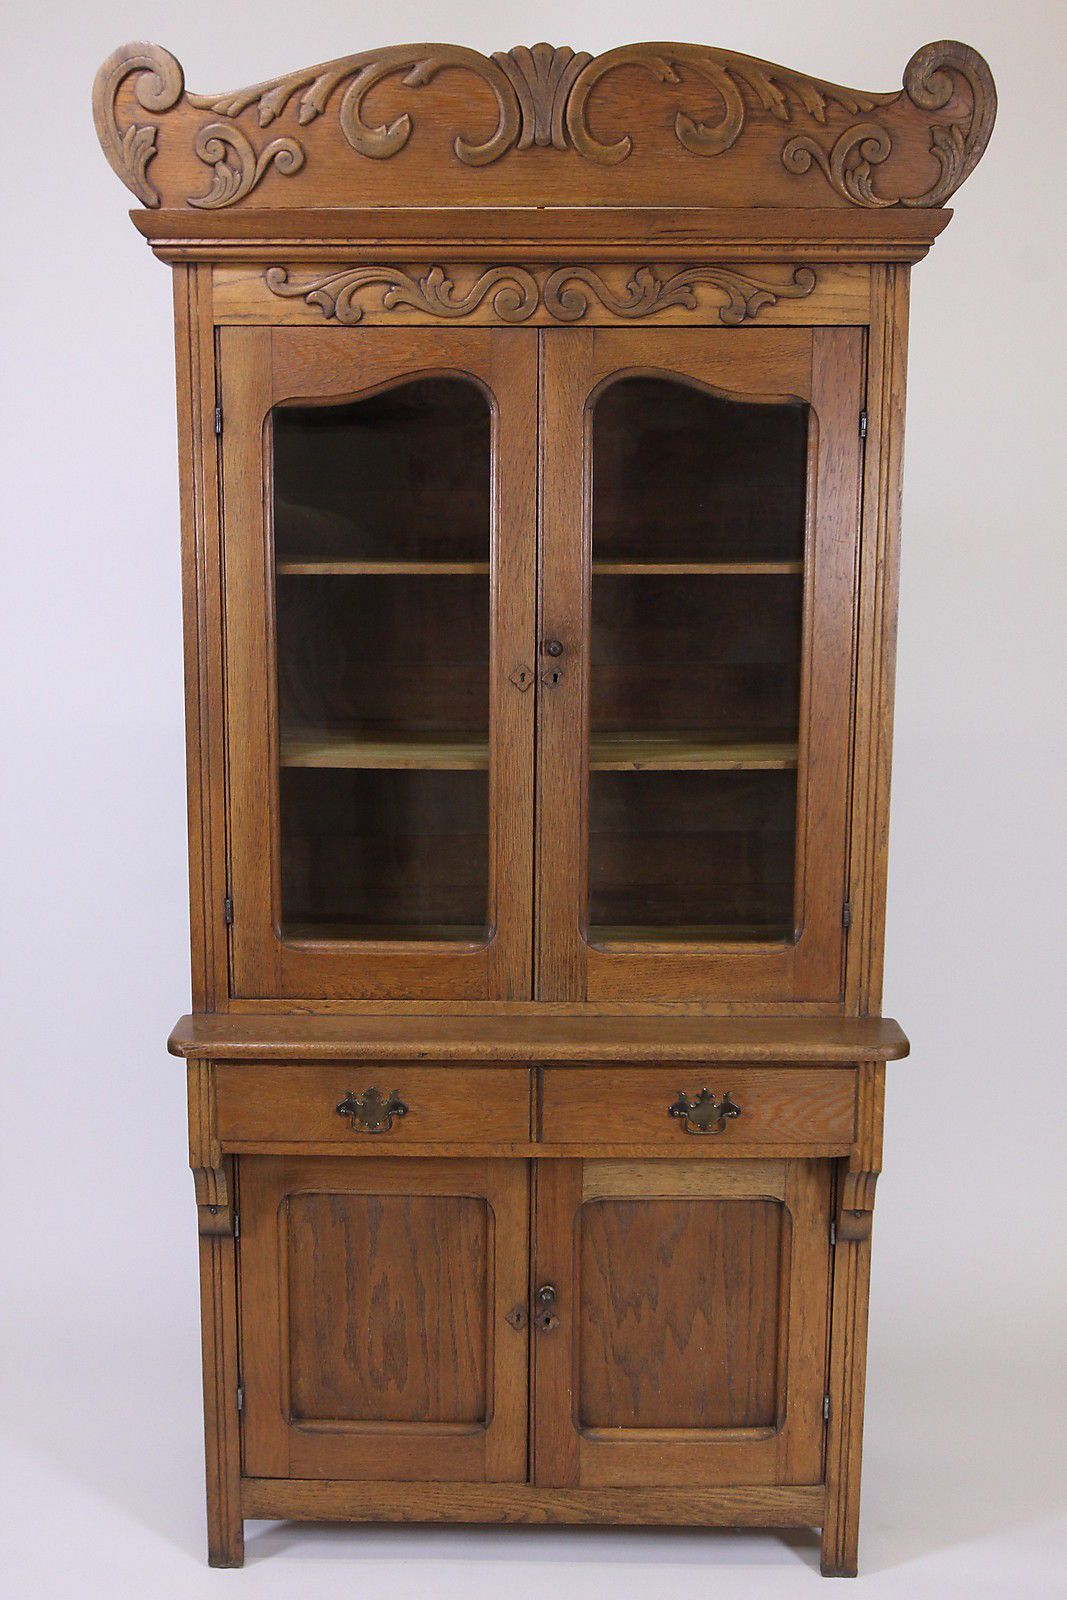 Sellers Kitchen Cabinet Antique Hoosier Sellers Cabinet Rare Find In This Oak Barrel